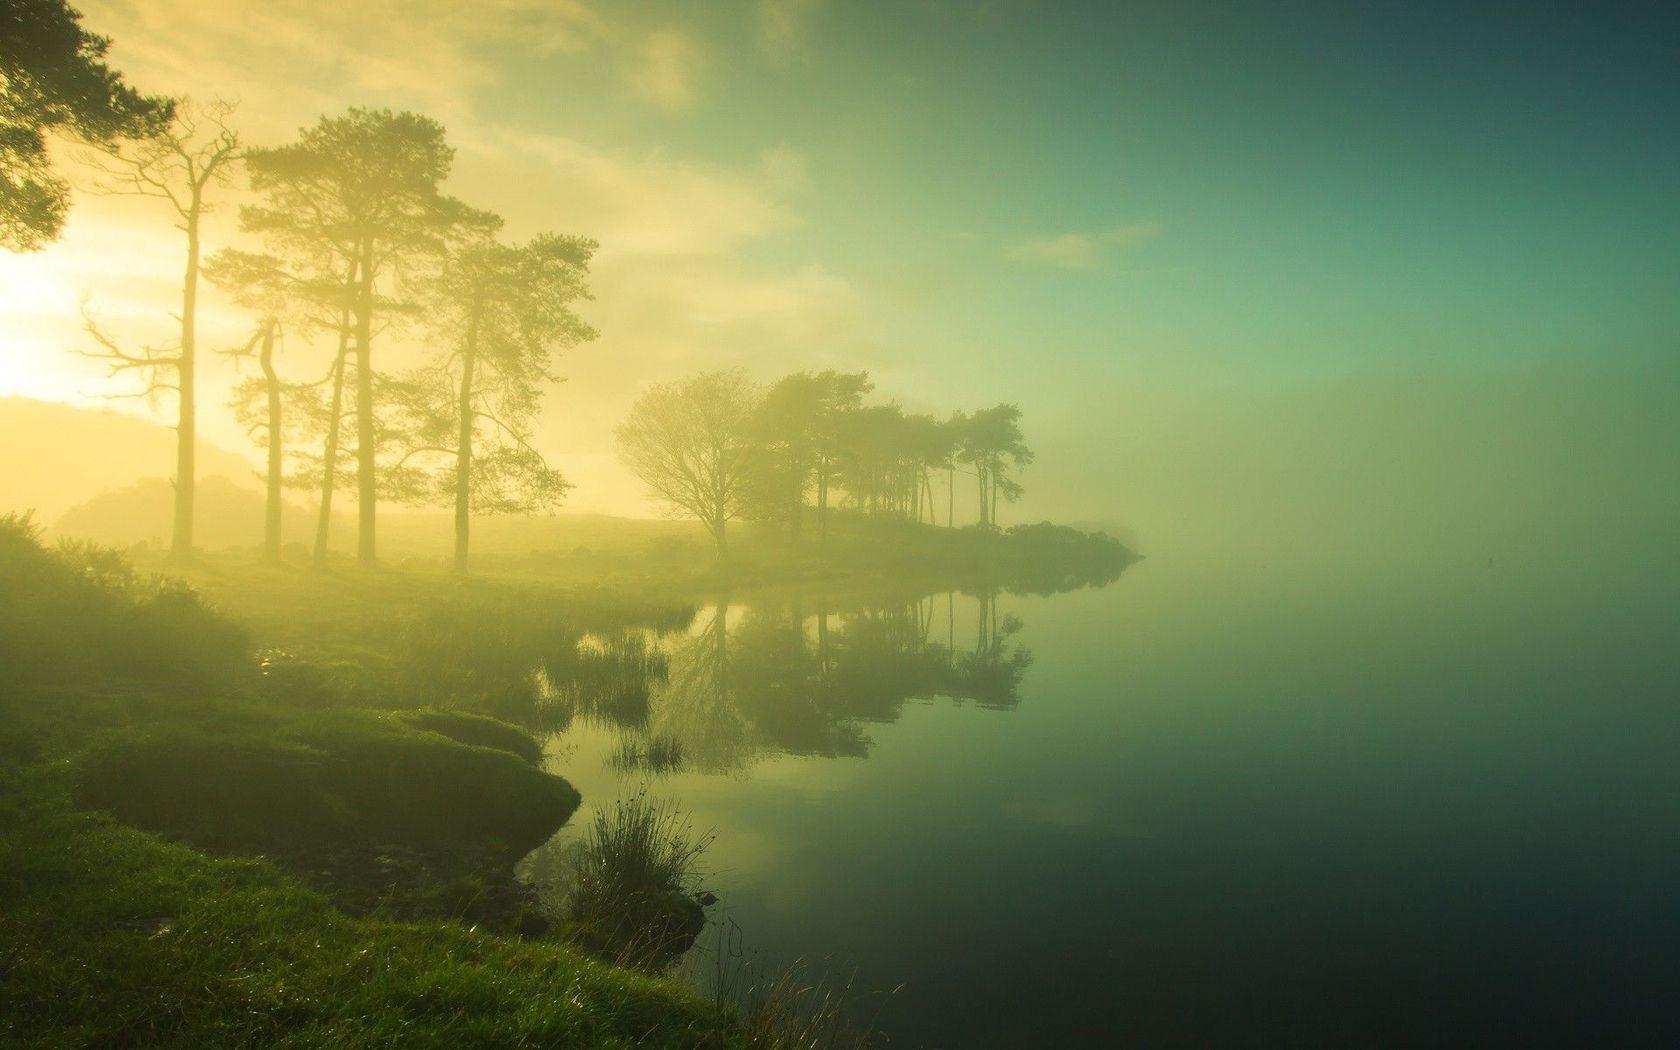 3d Fantasy Nature Wallpaper Mist Background 27420 1680x1050 Px Hdwallsource Com